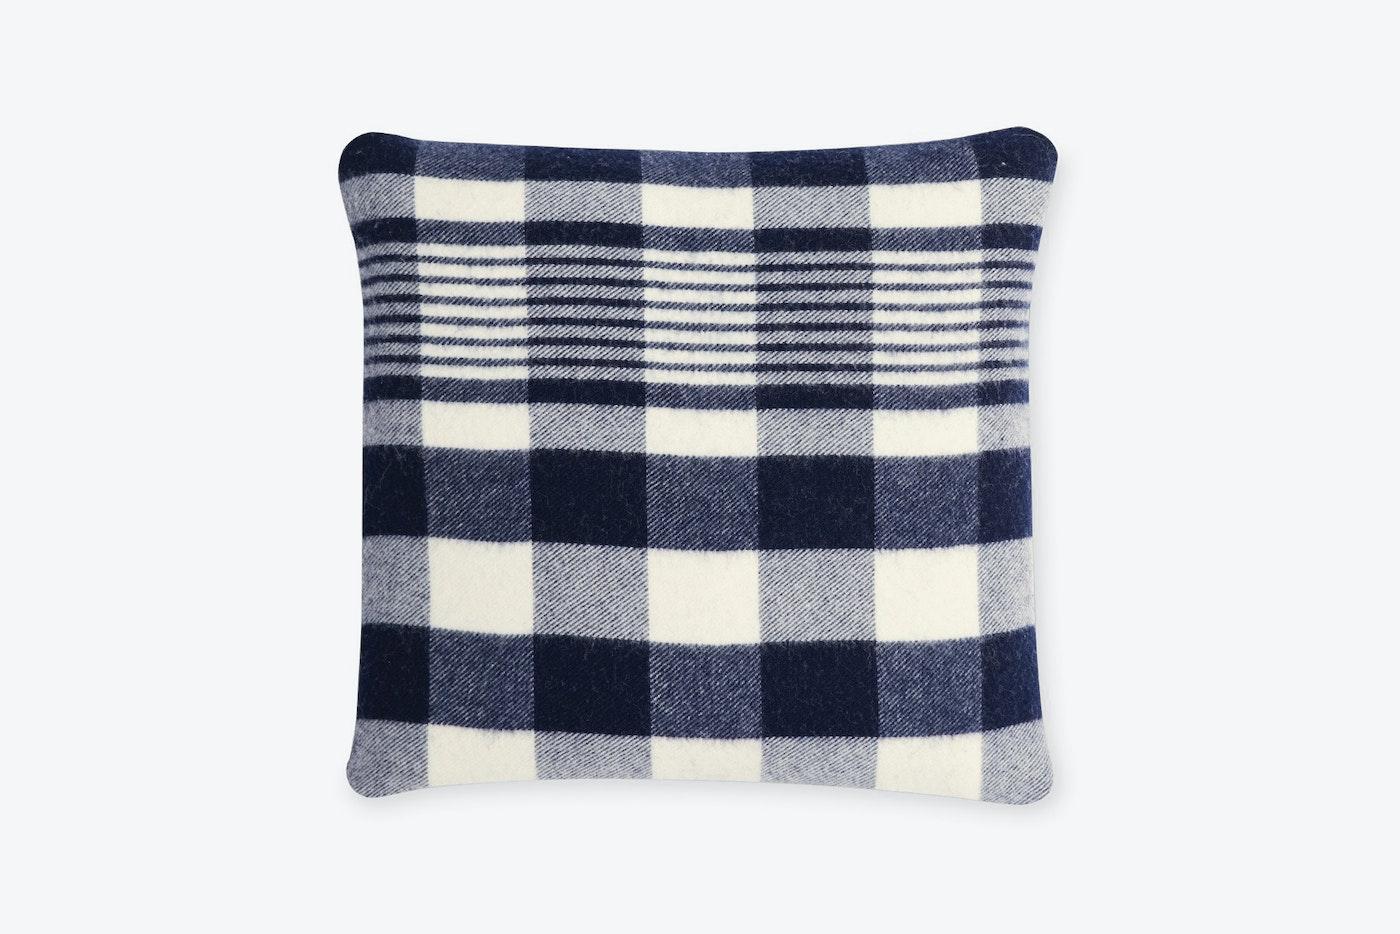 plaid %28navy%29 pillow